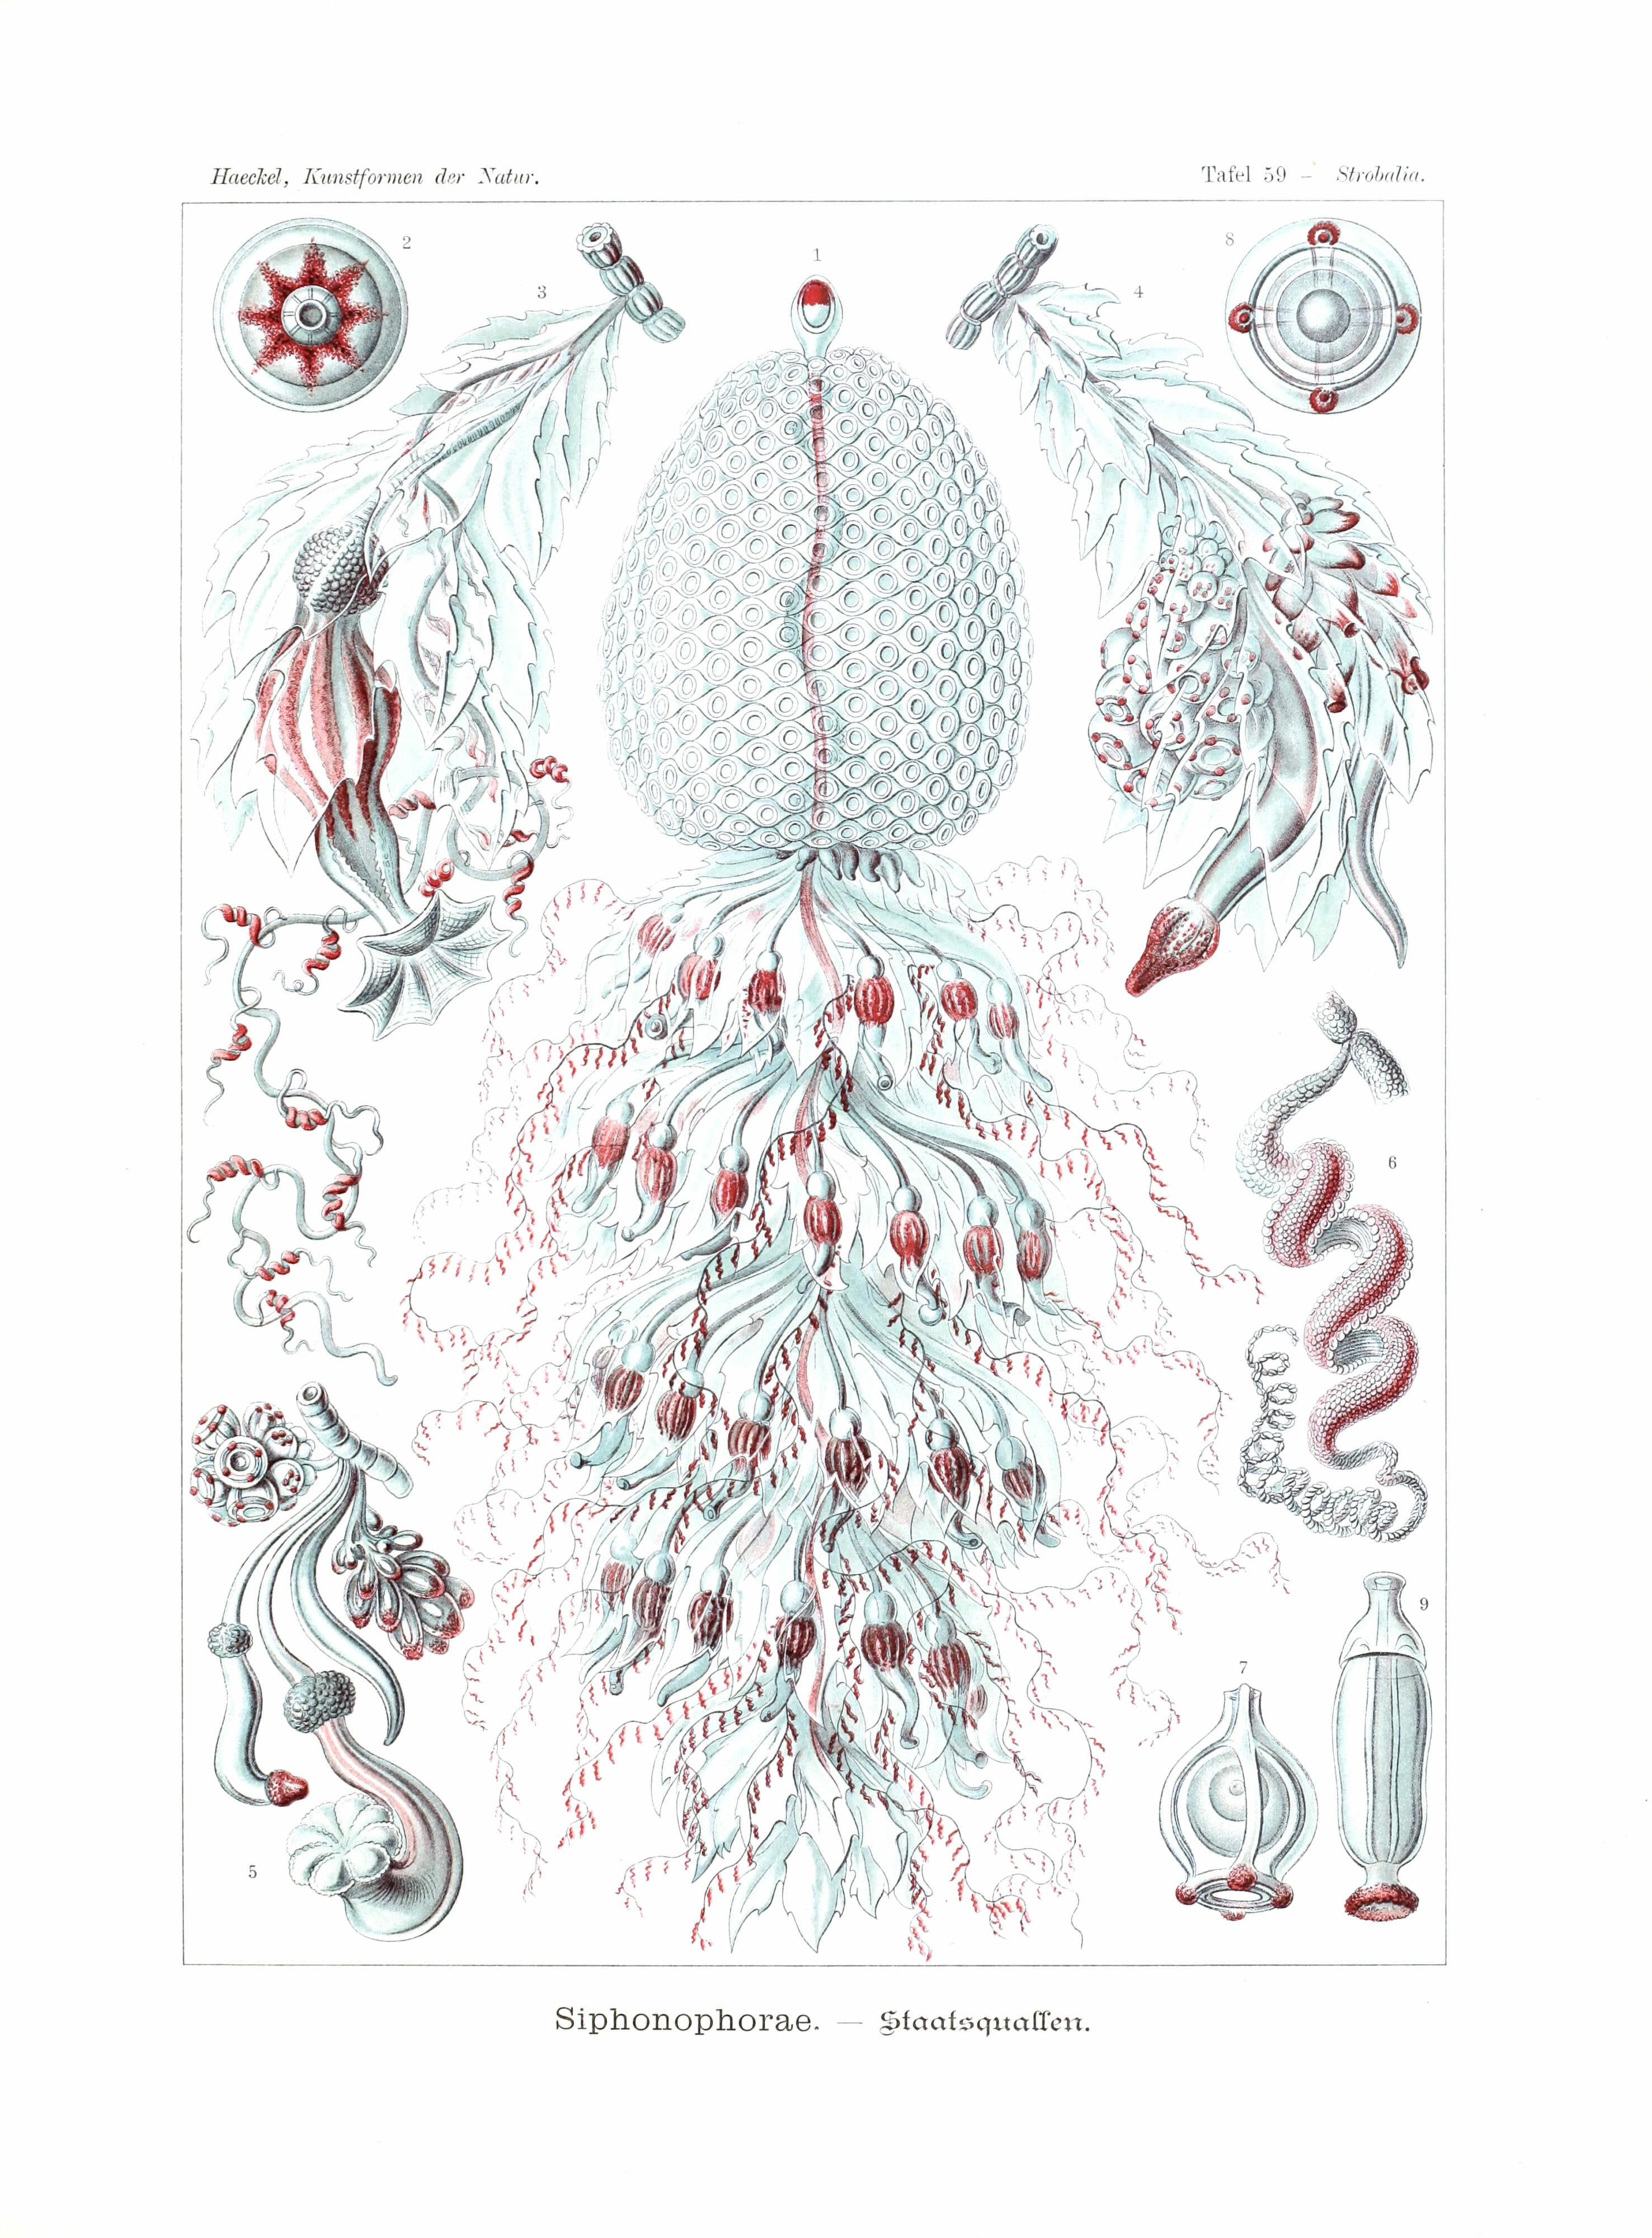 ernst haeckel illustrations deep sea siphonophorae